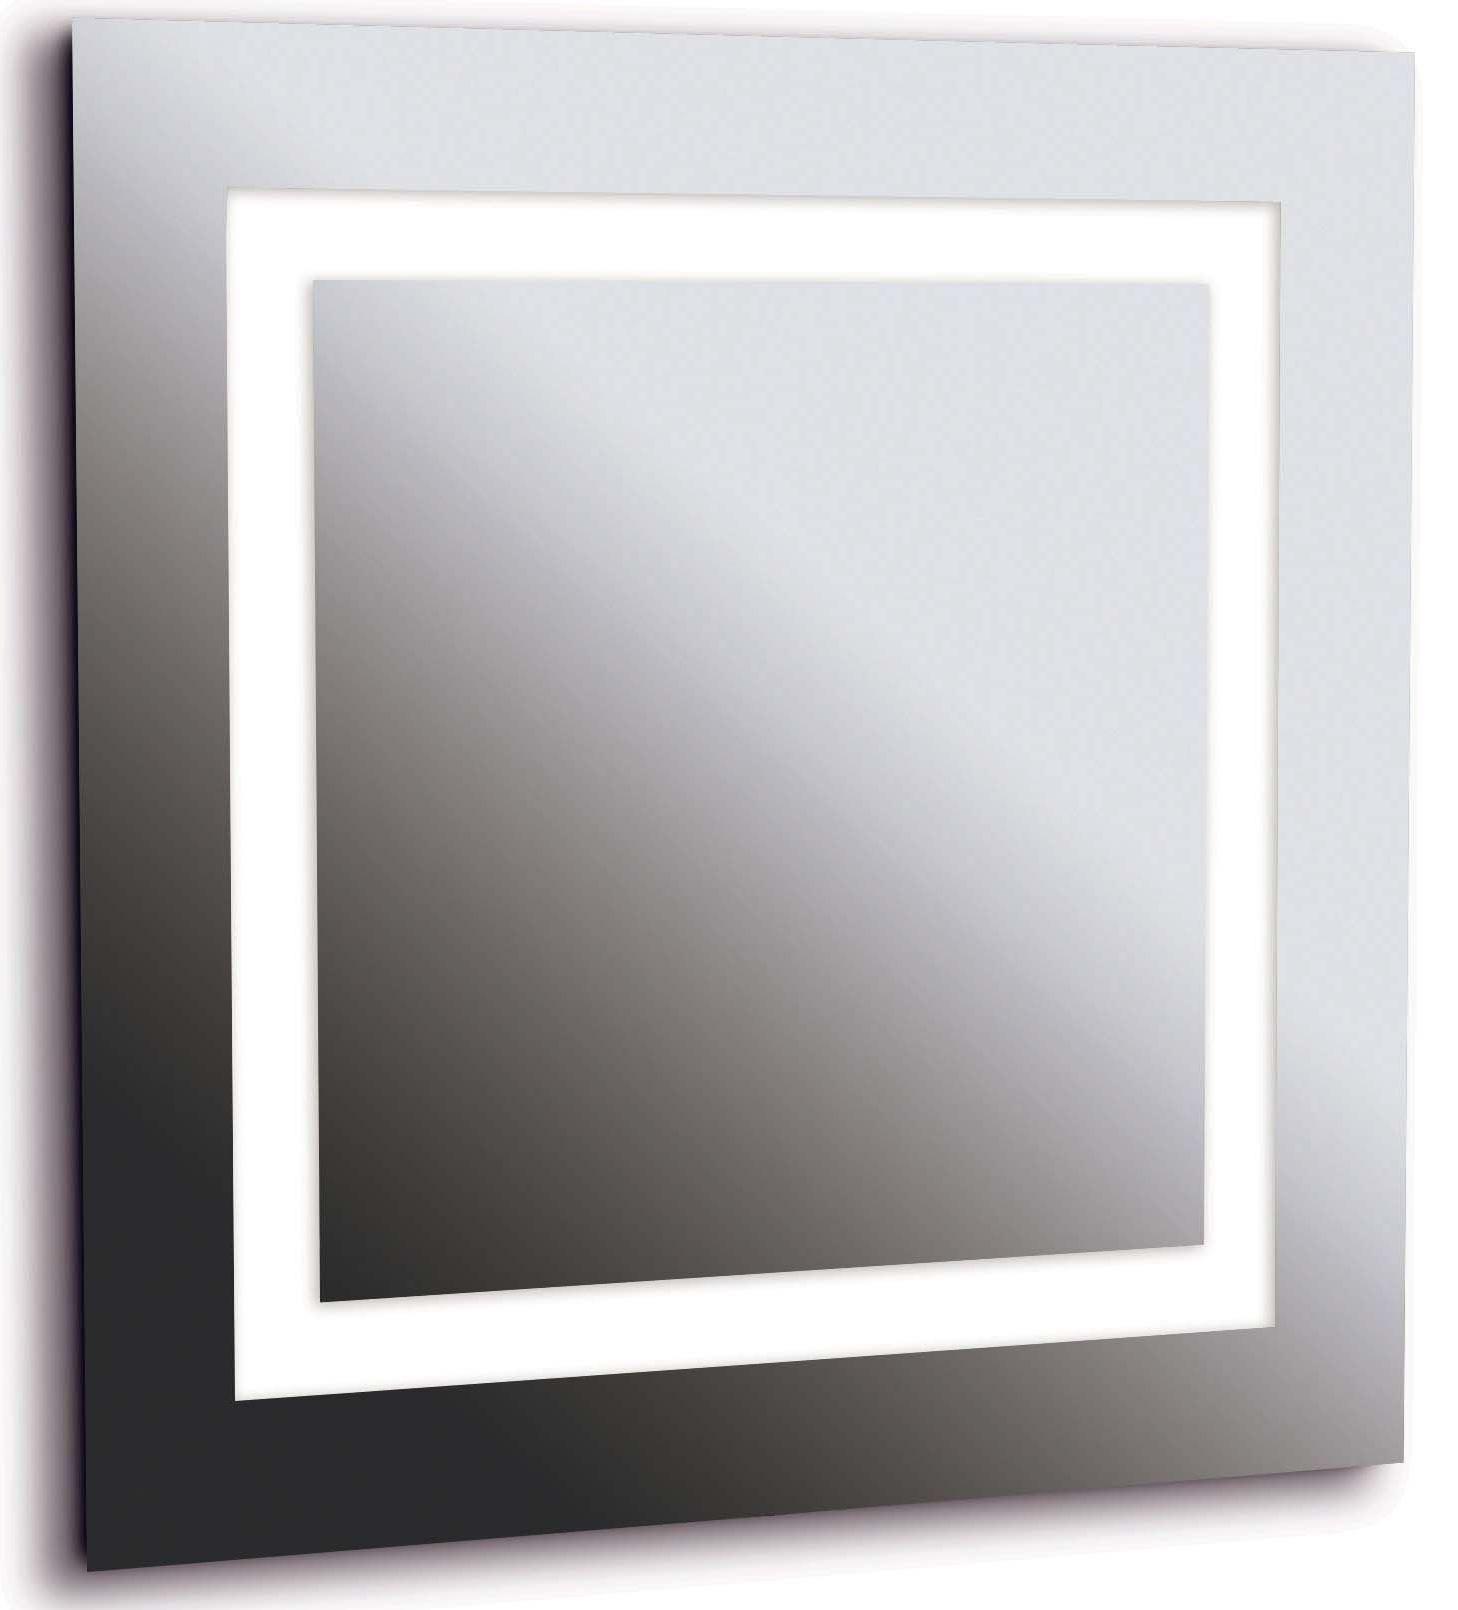 rifletta 4 light vanity mirror from kenroy 90832 coleman furniture. Black Bedroom Furniture Sets. Home Design Ideas